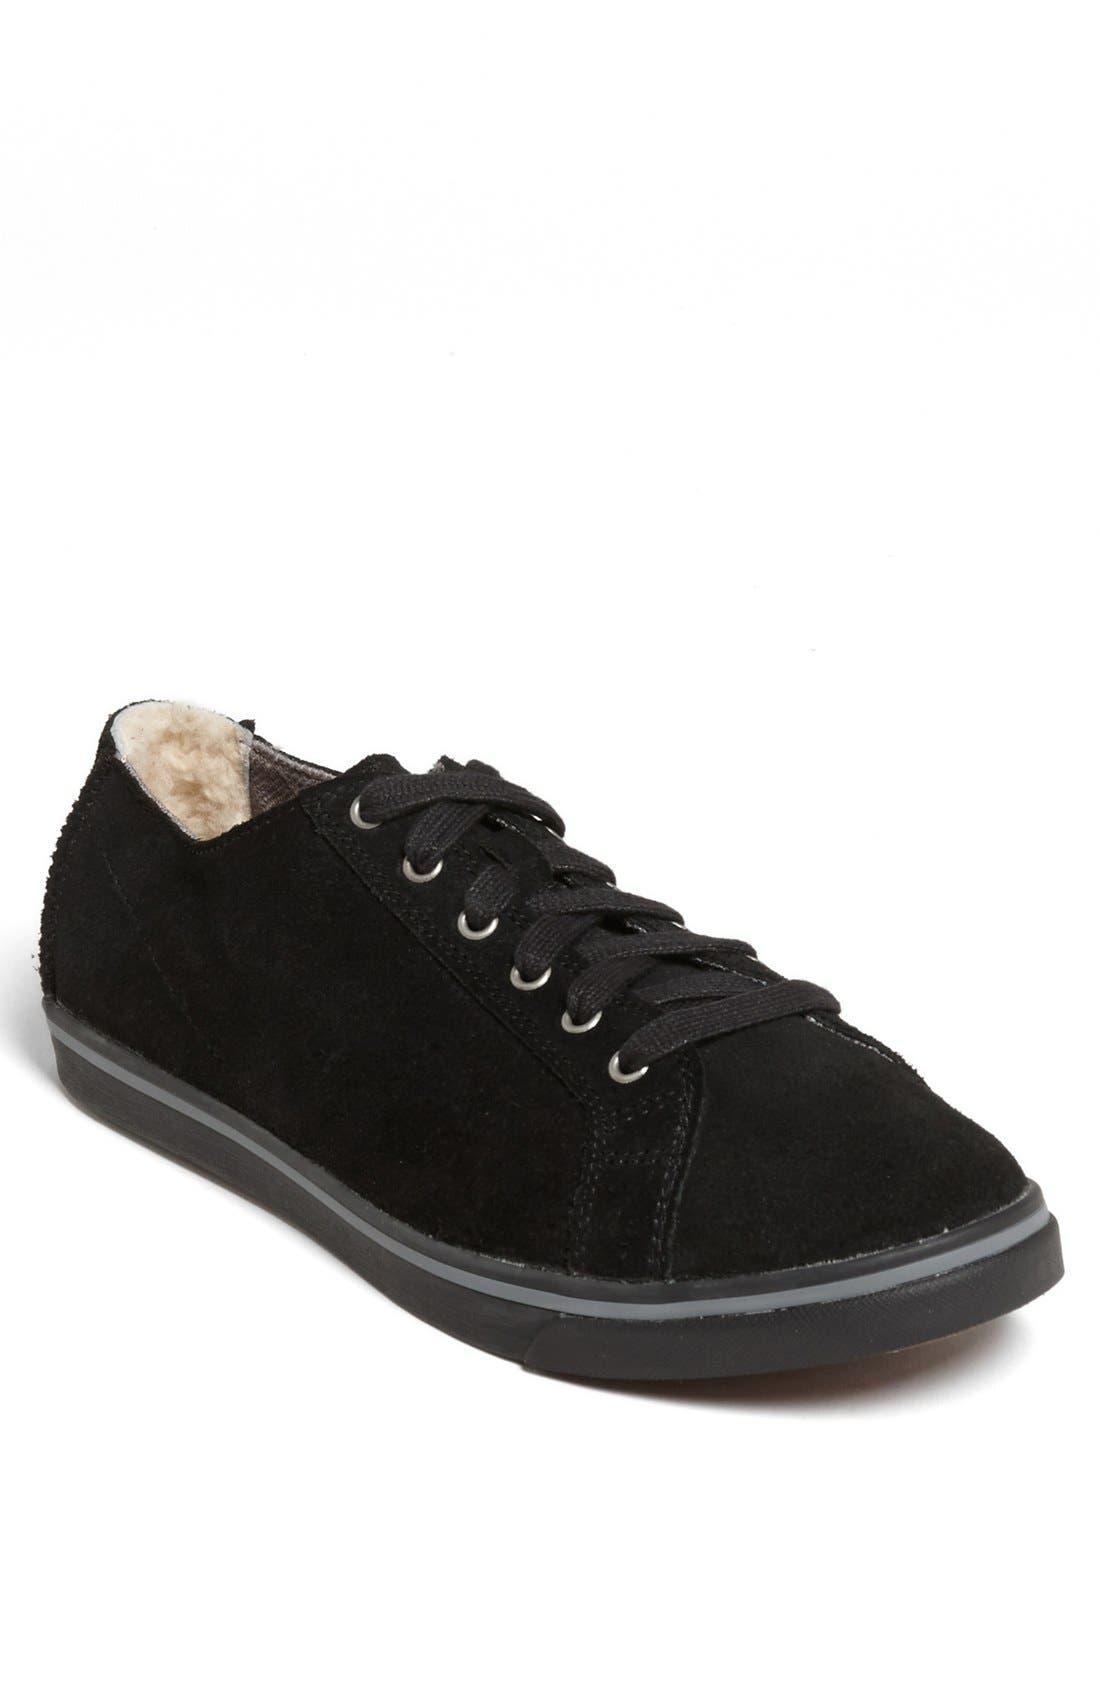 Alternate Image 1 Selected - UGG® Australia 'Vanowen' Sneaker (Men)